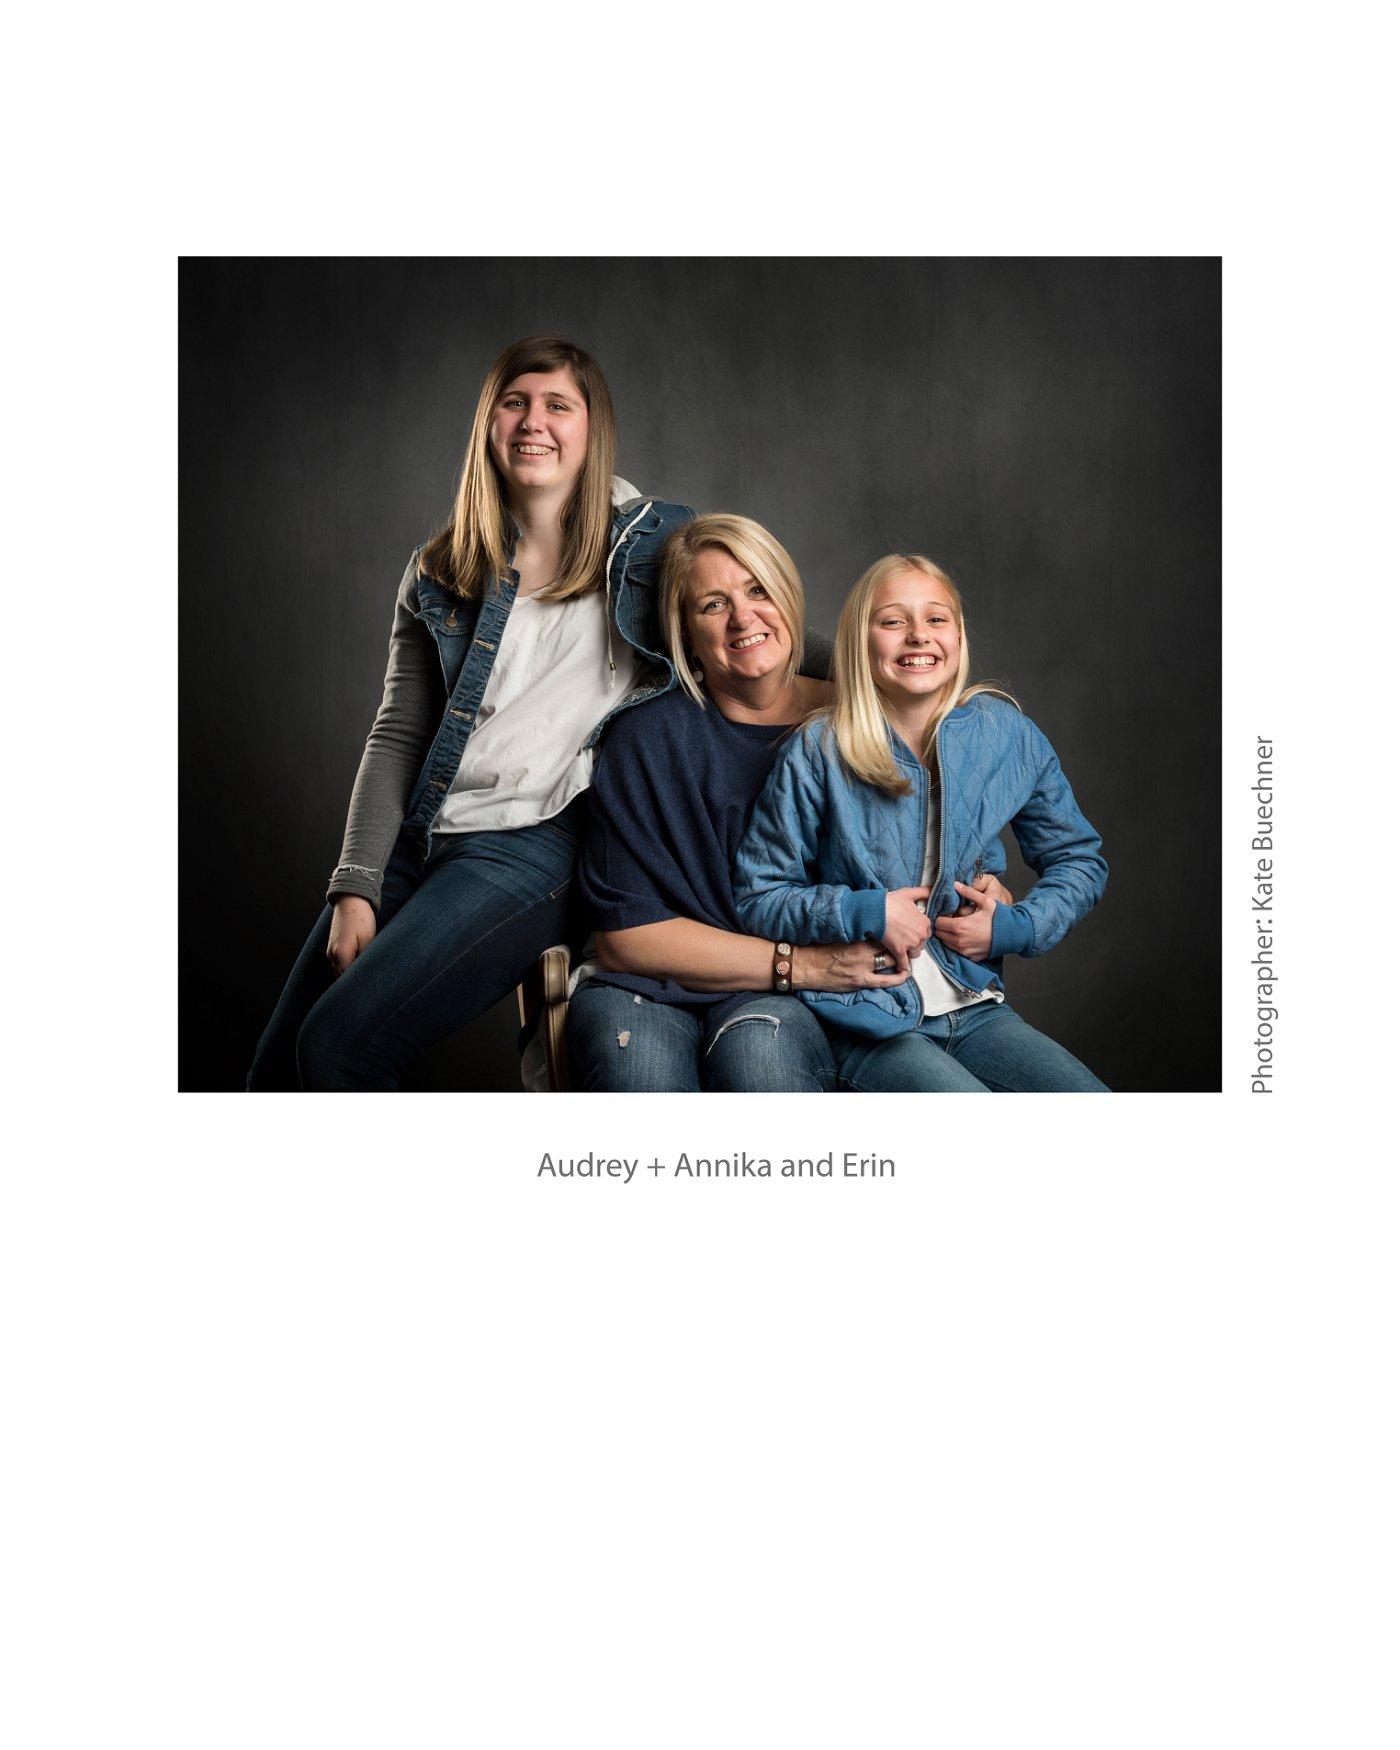 family-photographer-northshore (4).jpg